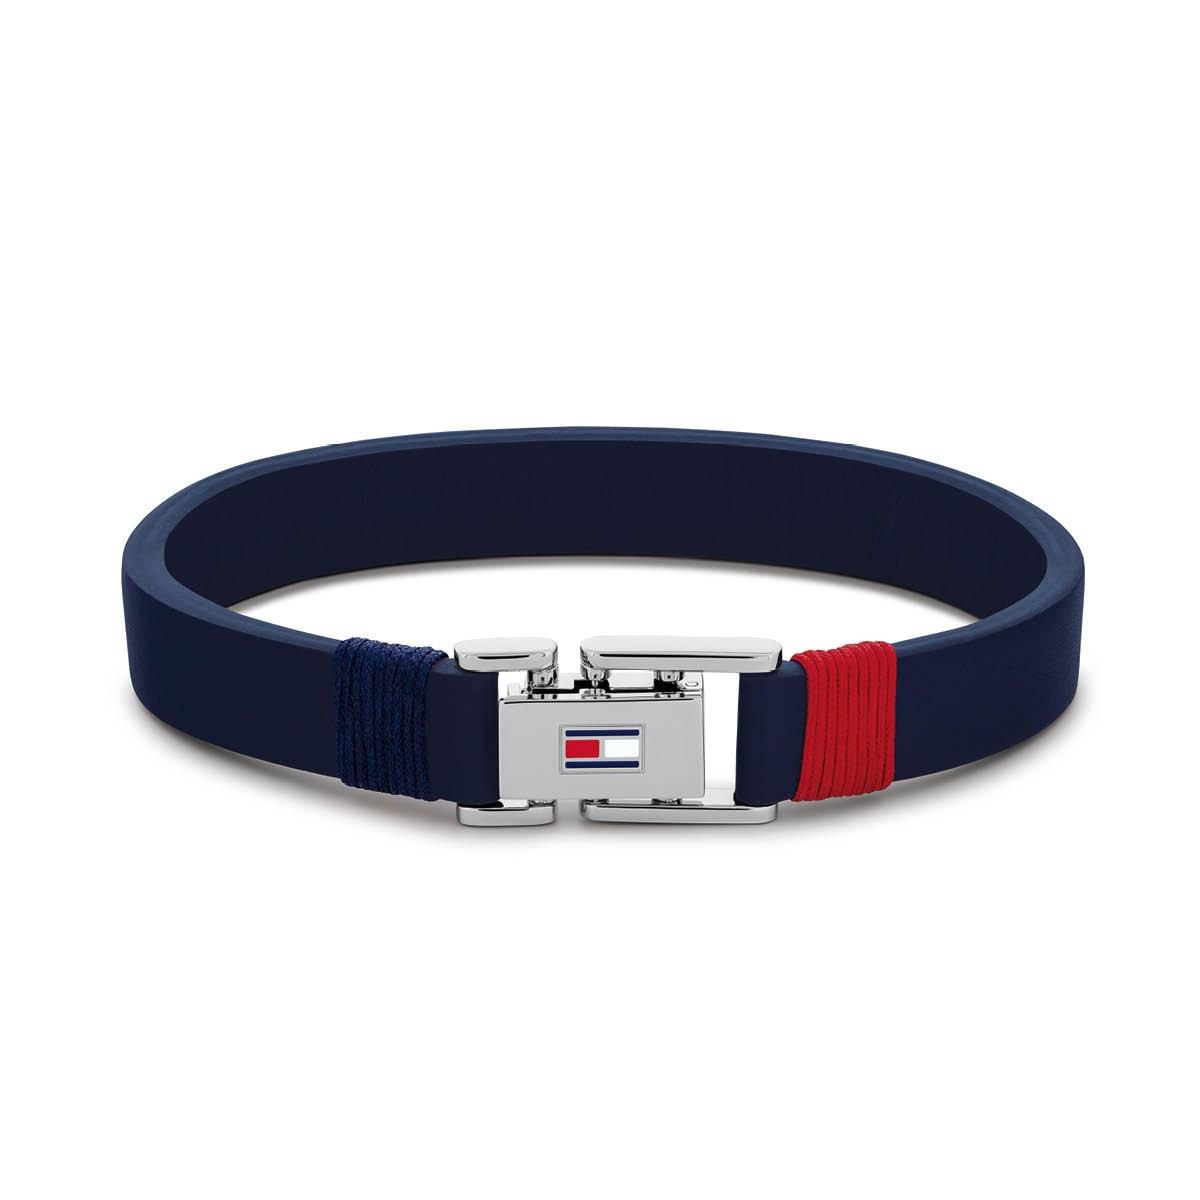 Denim bracelet TJ2790226S (Taille: 19.50 cm) - Tommy hilfiger - Modalova